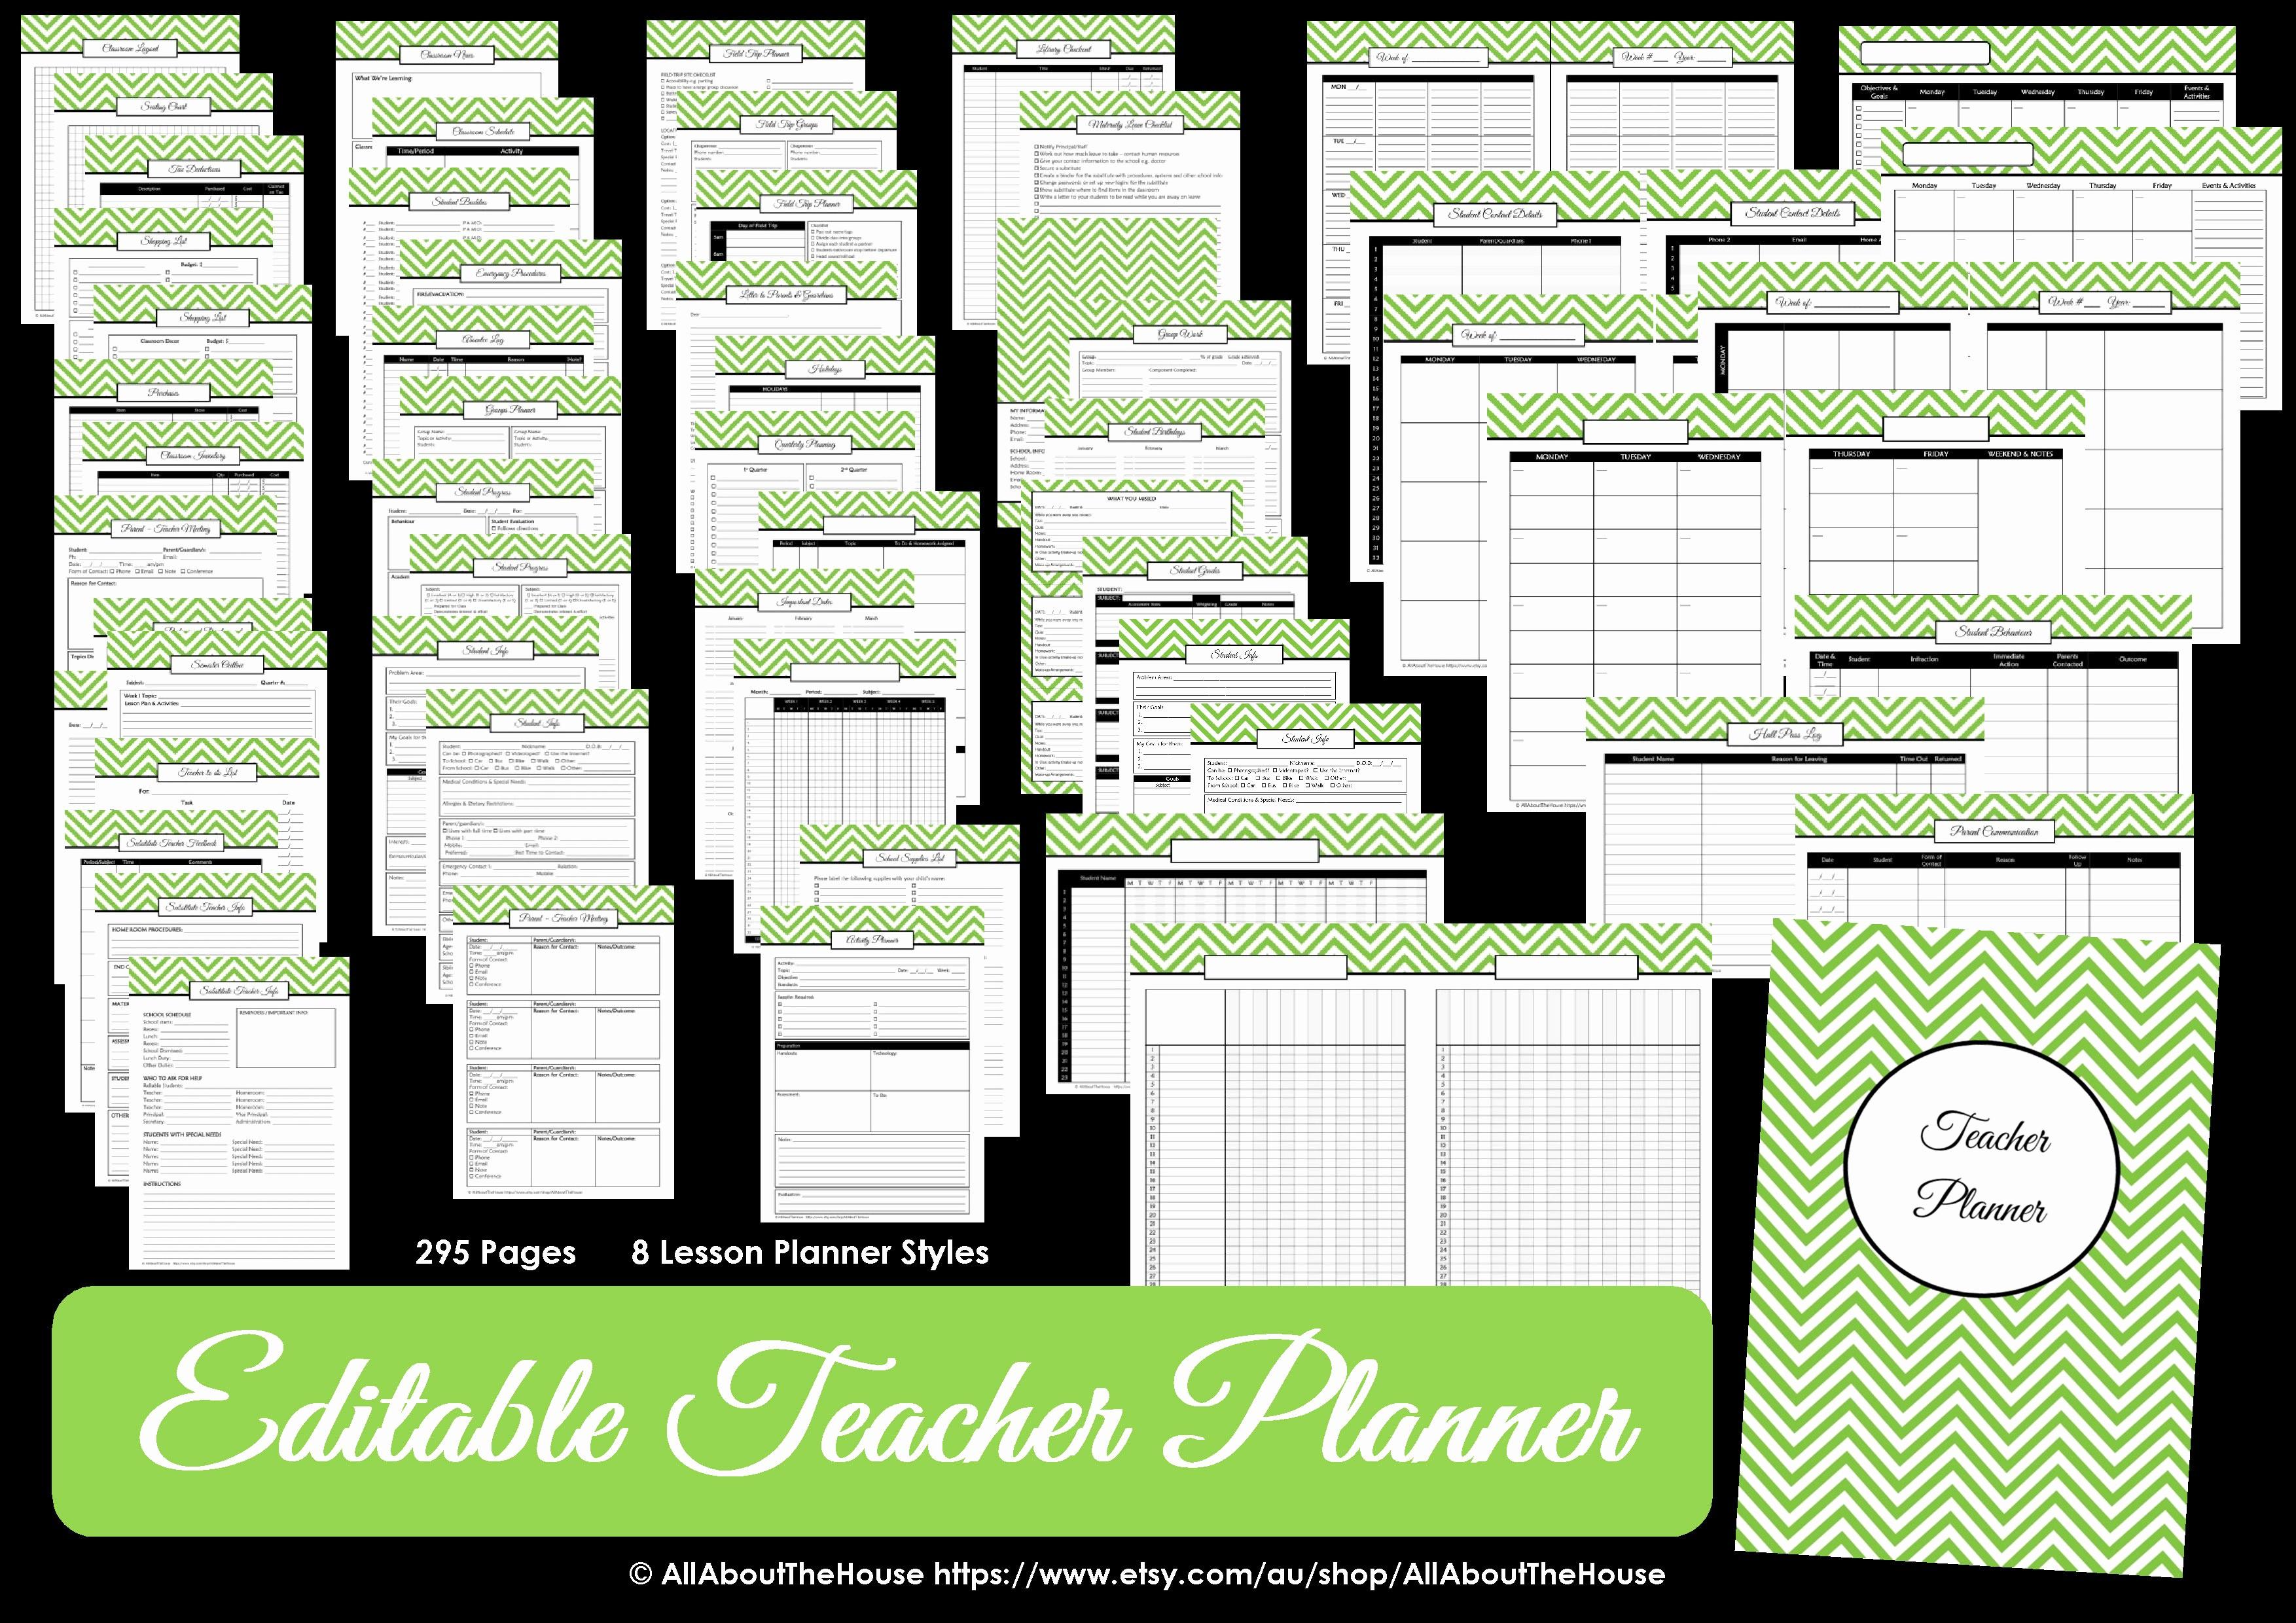 Free Editable Calendar for Teachers Luxury Editable Chevron Printable Teacher Planner